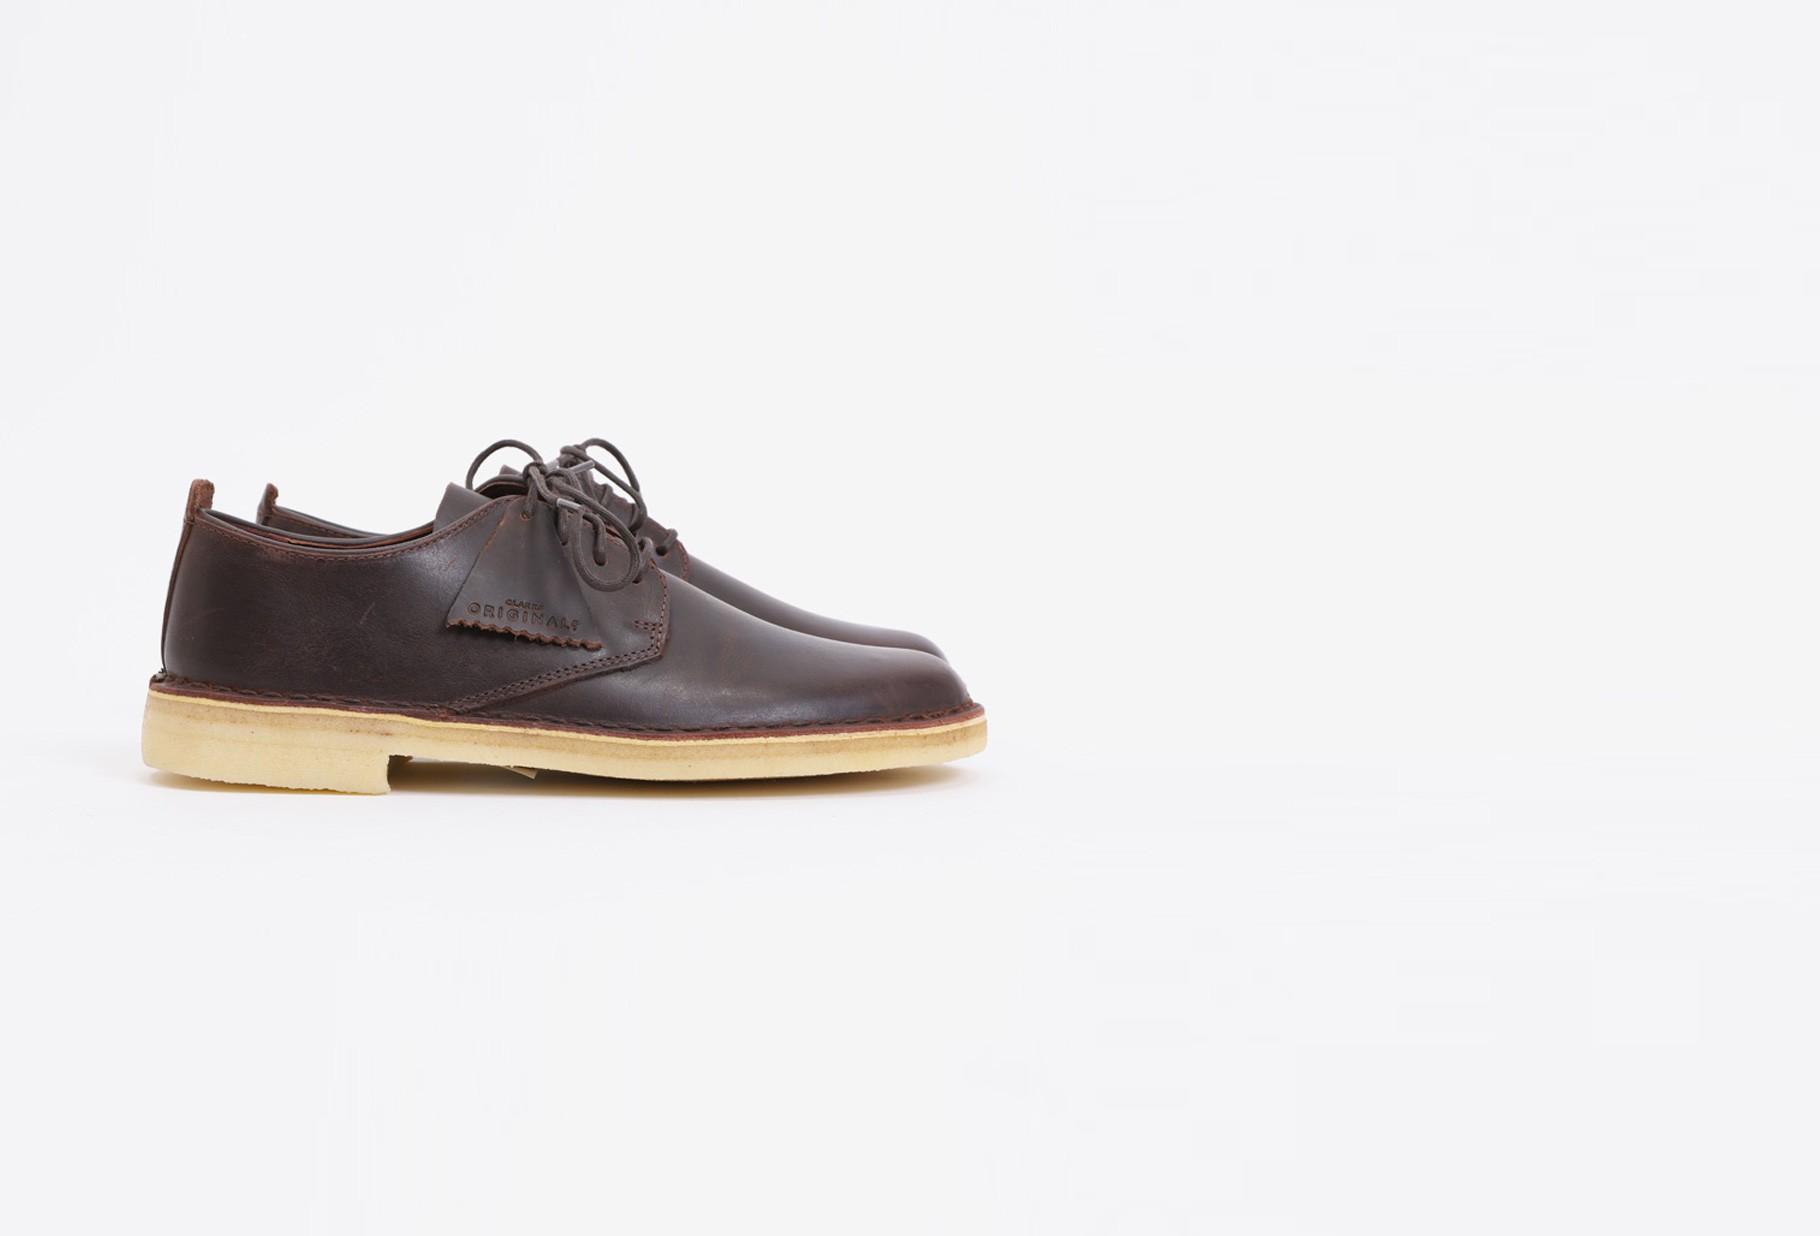 CLARKS ORIGINALS / Desert london Chestnut leather